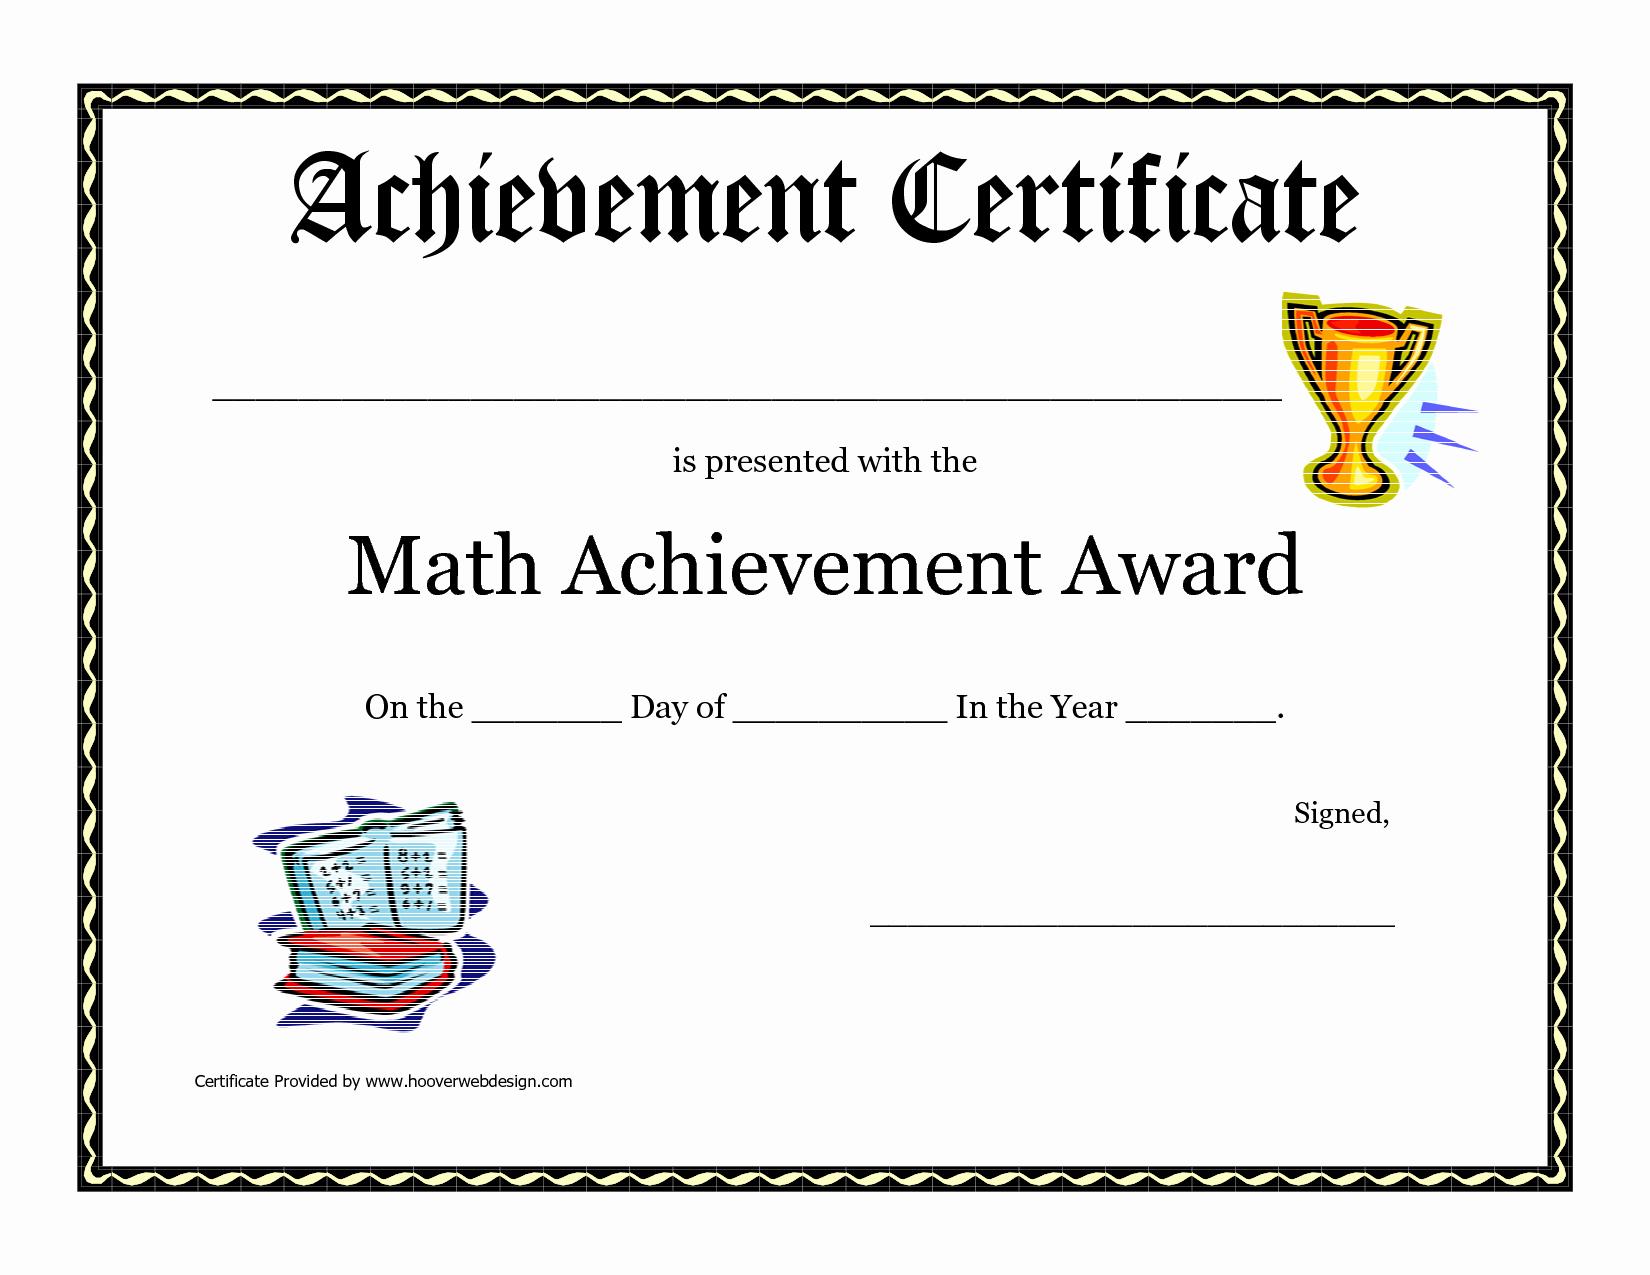 Pdf Certificate Template Free Inspirational Math Achievement Award Printable Certificate Pdf